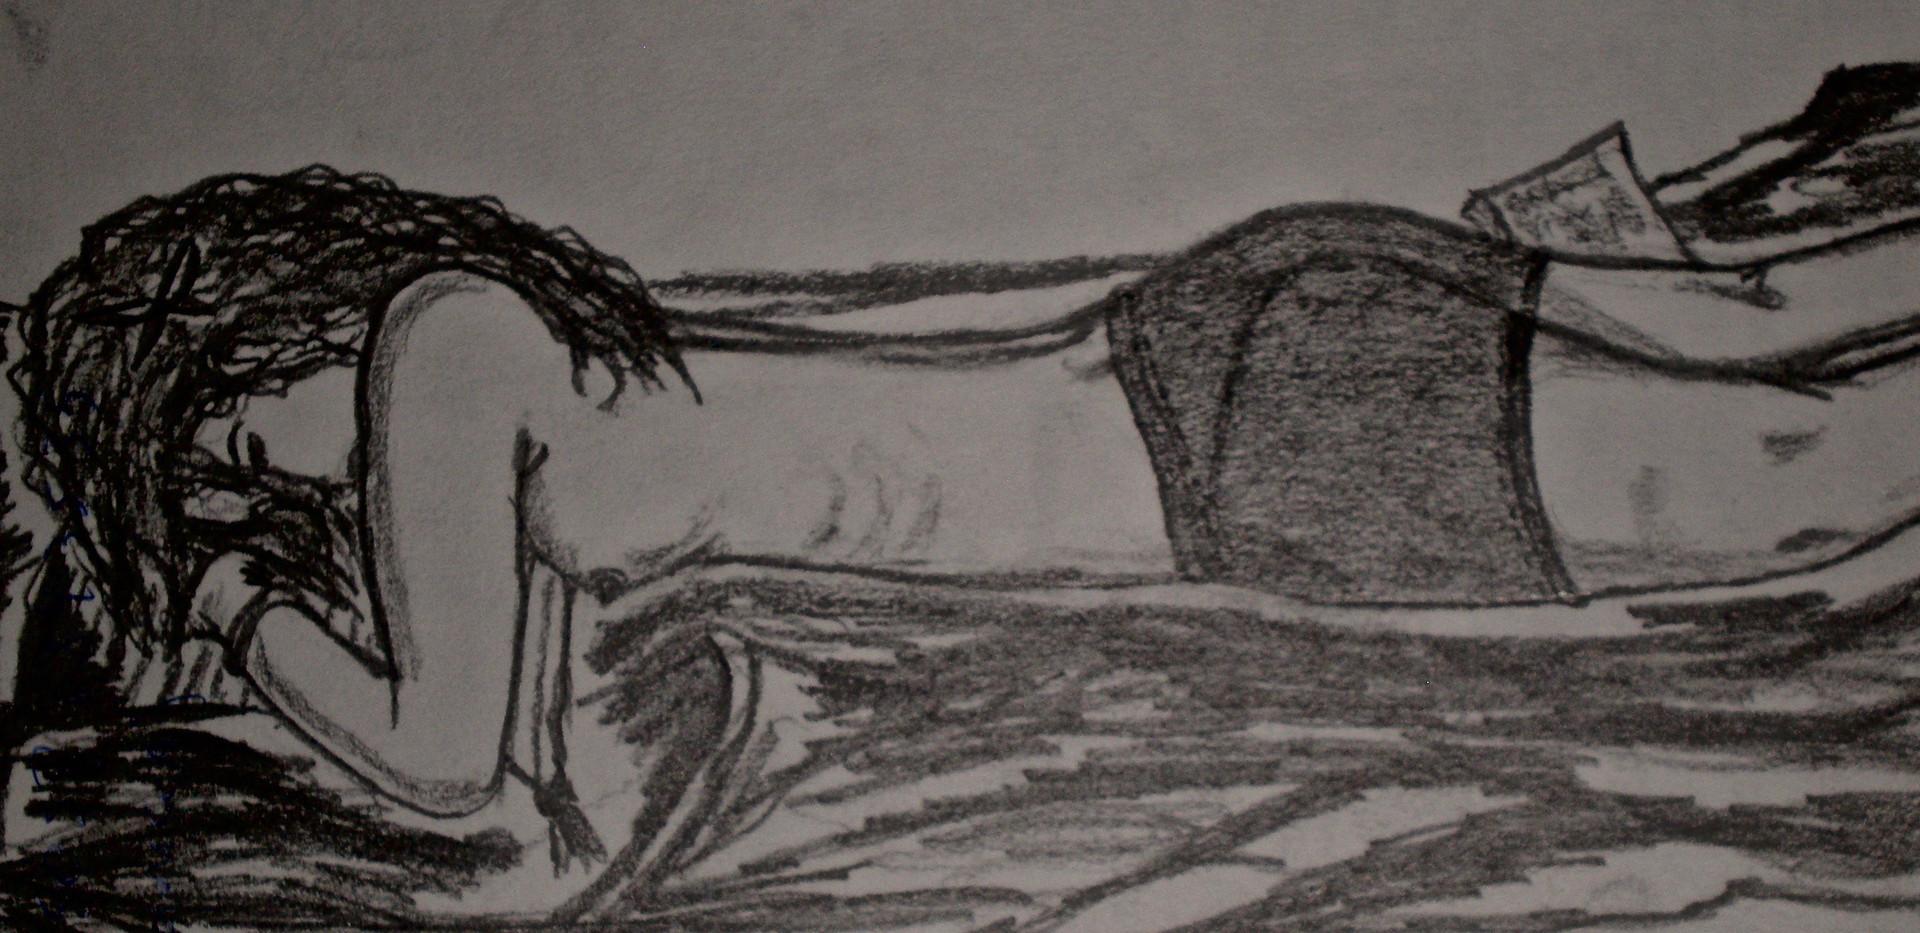 Nude Nicaraguan Woman. Pencil on Paper.